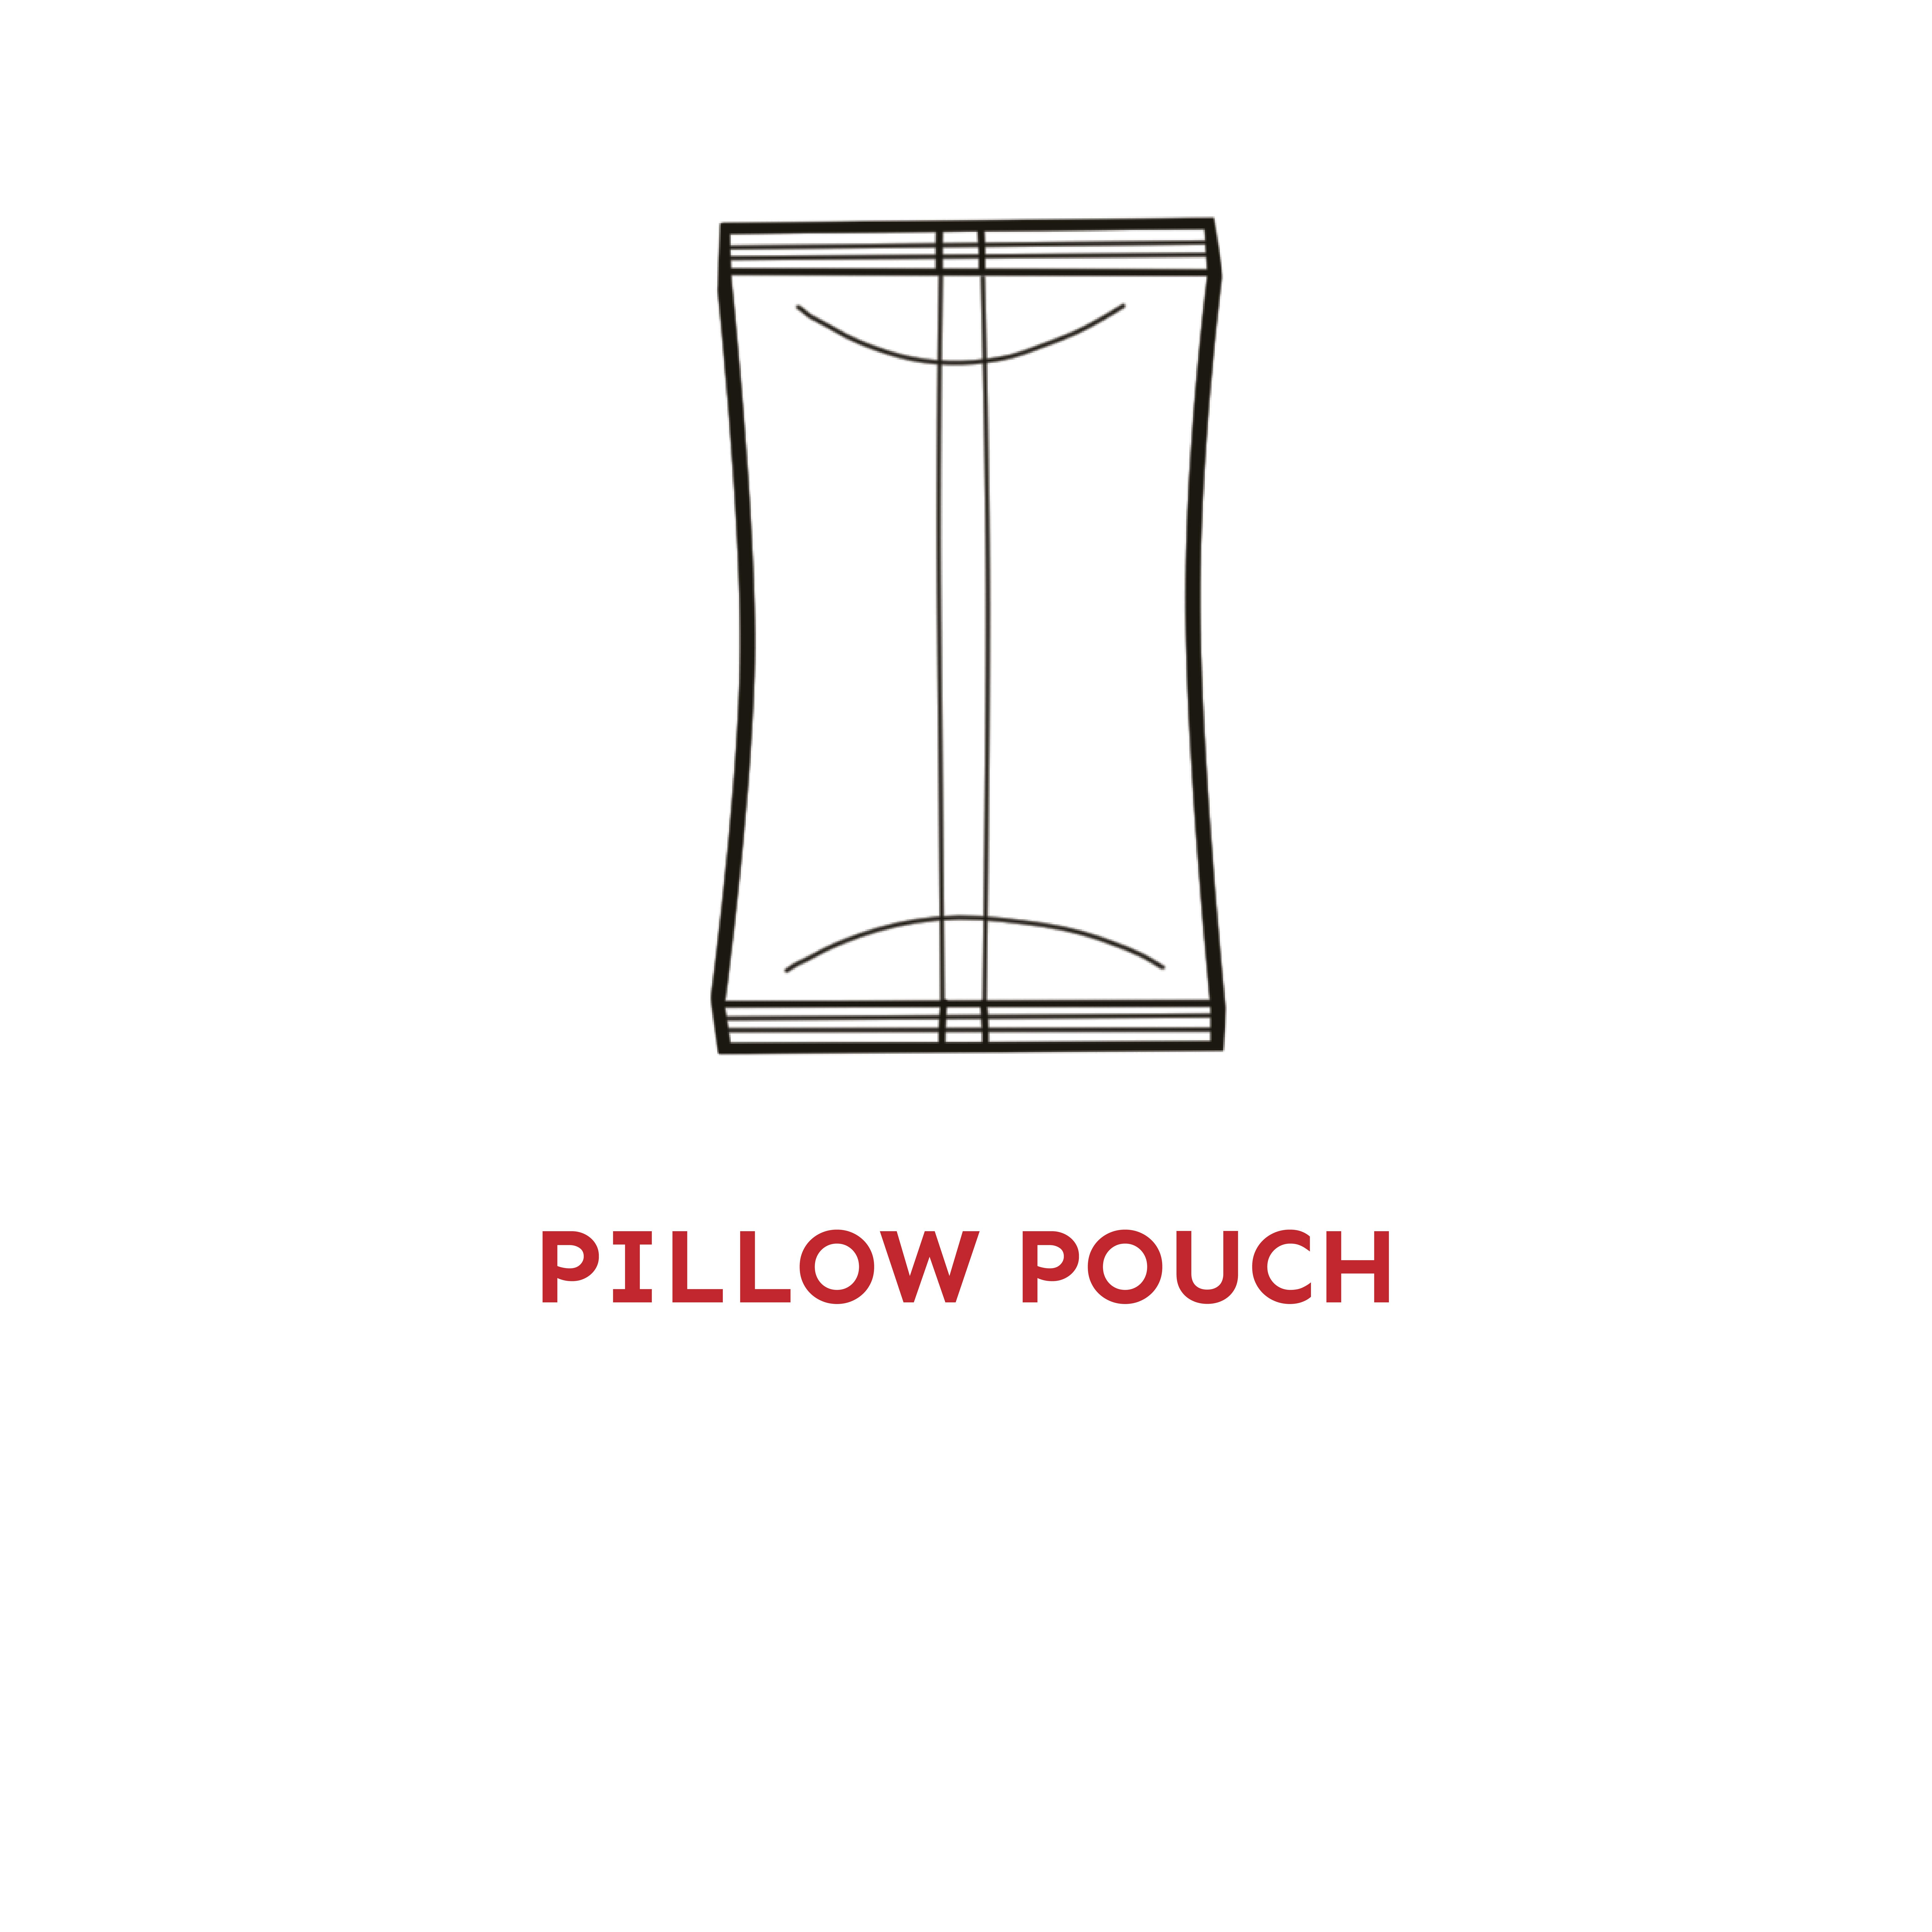 Pillow Pouch Packaging